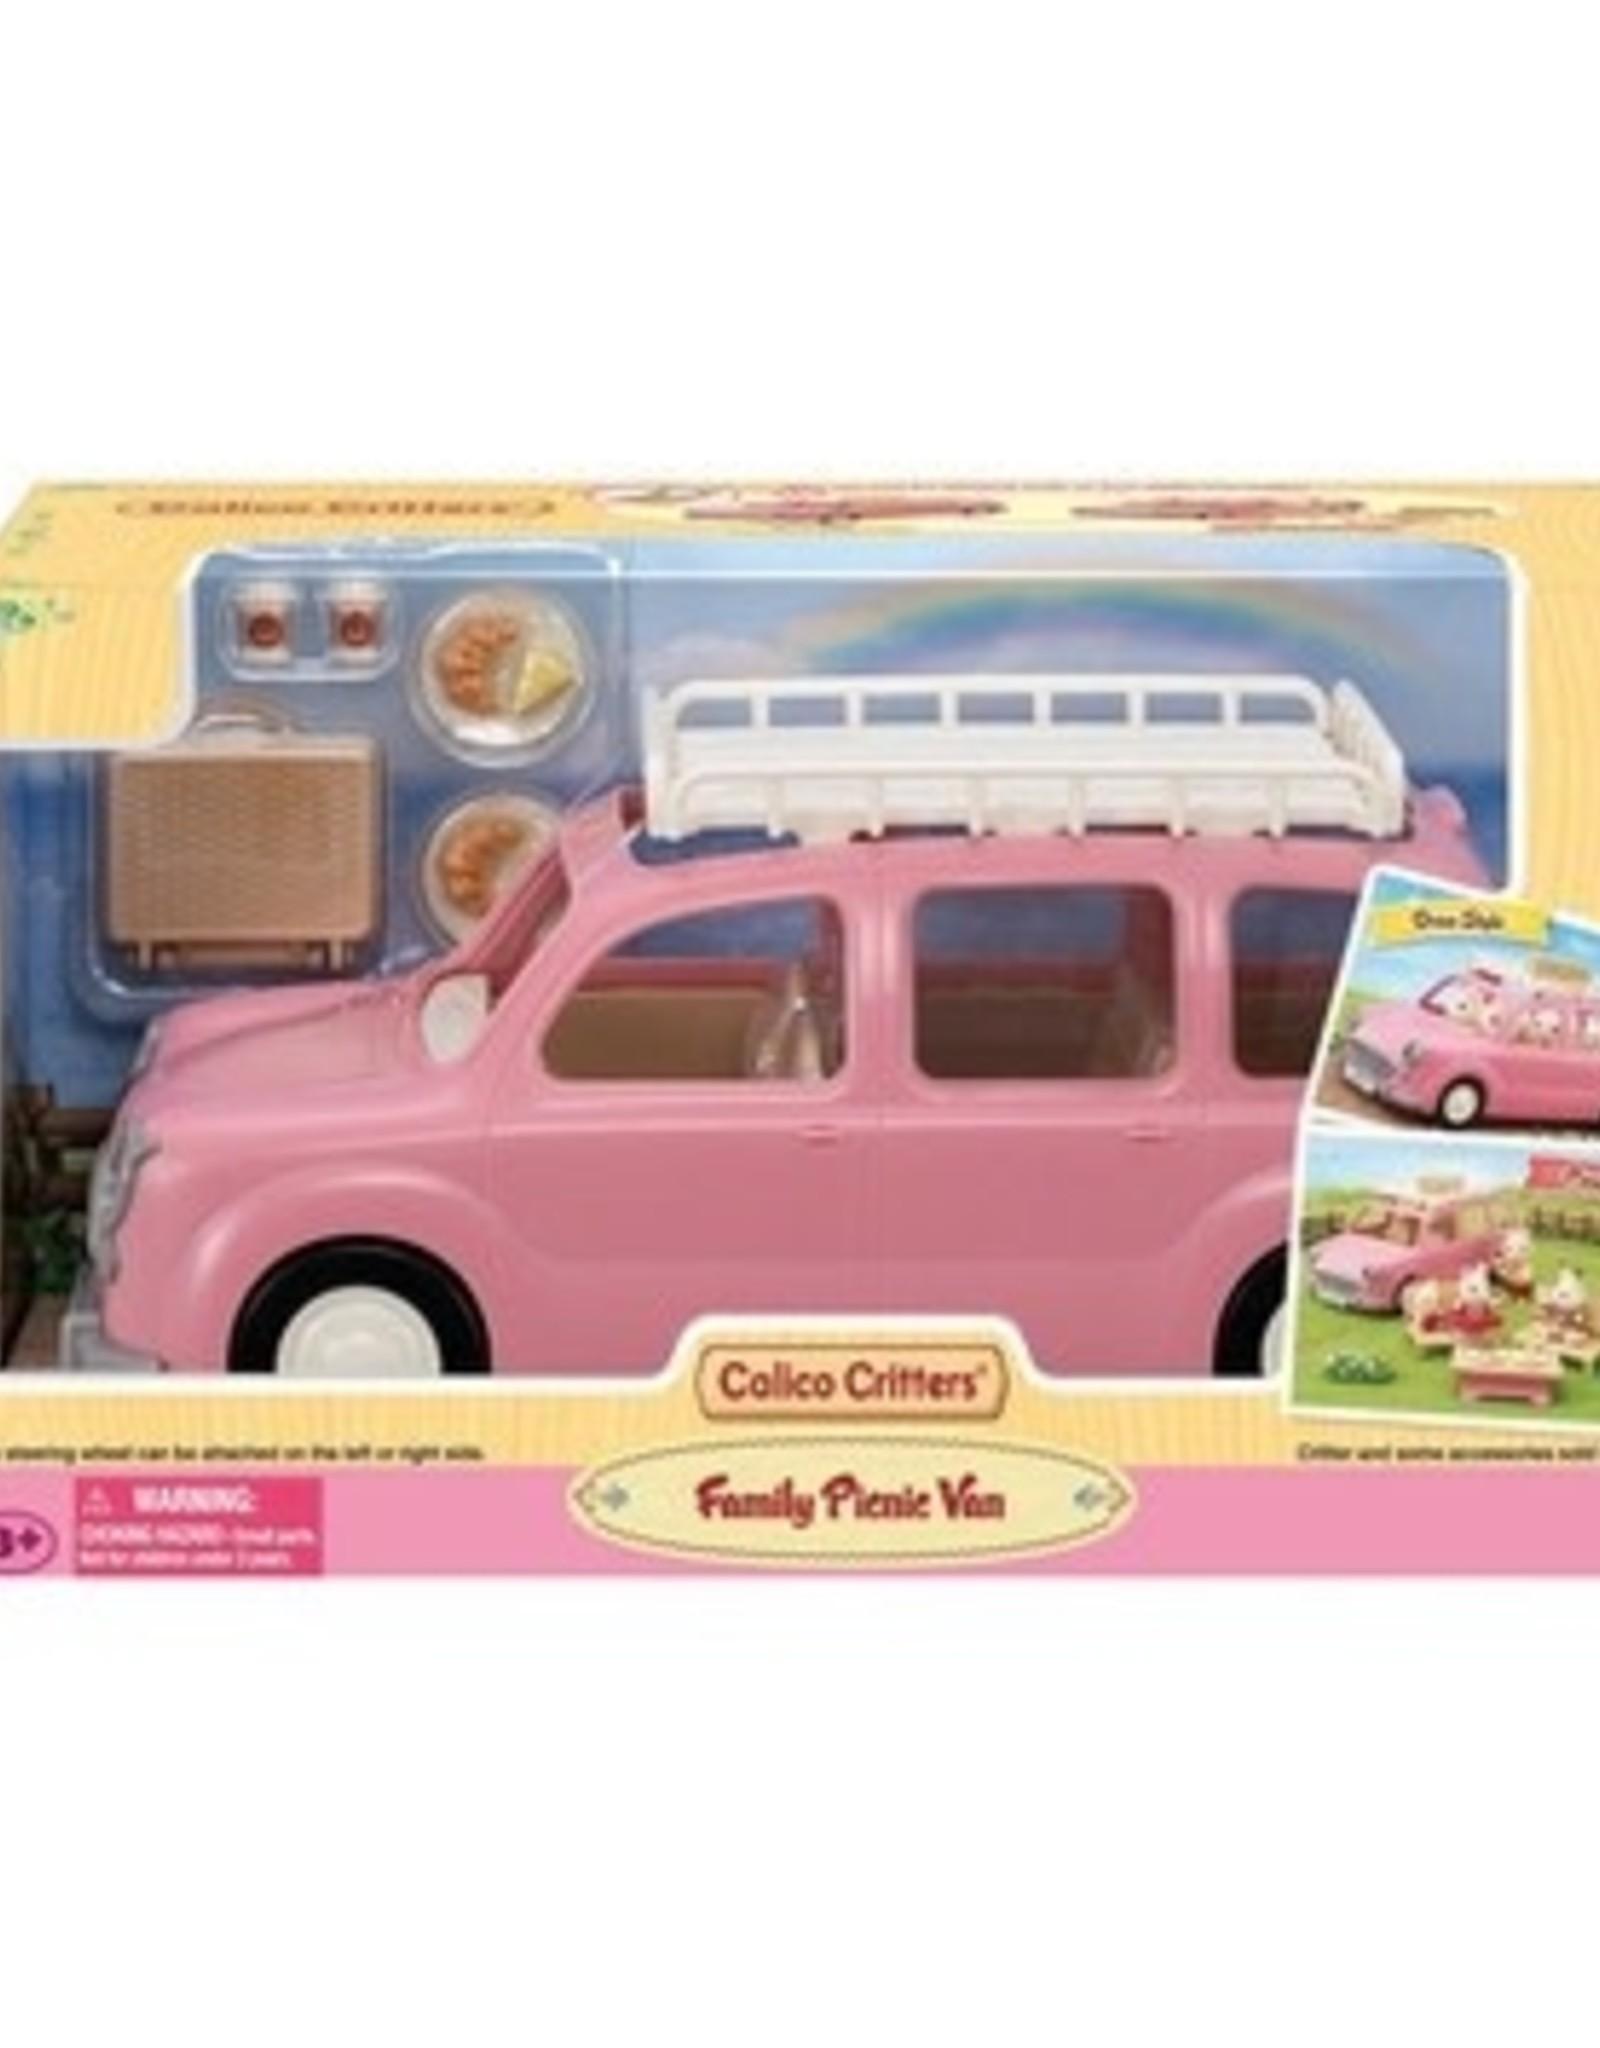 Calico Critters: Family Picnic Van